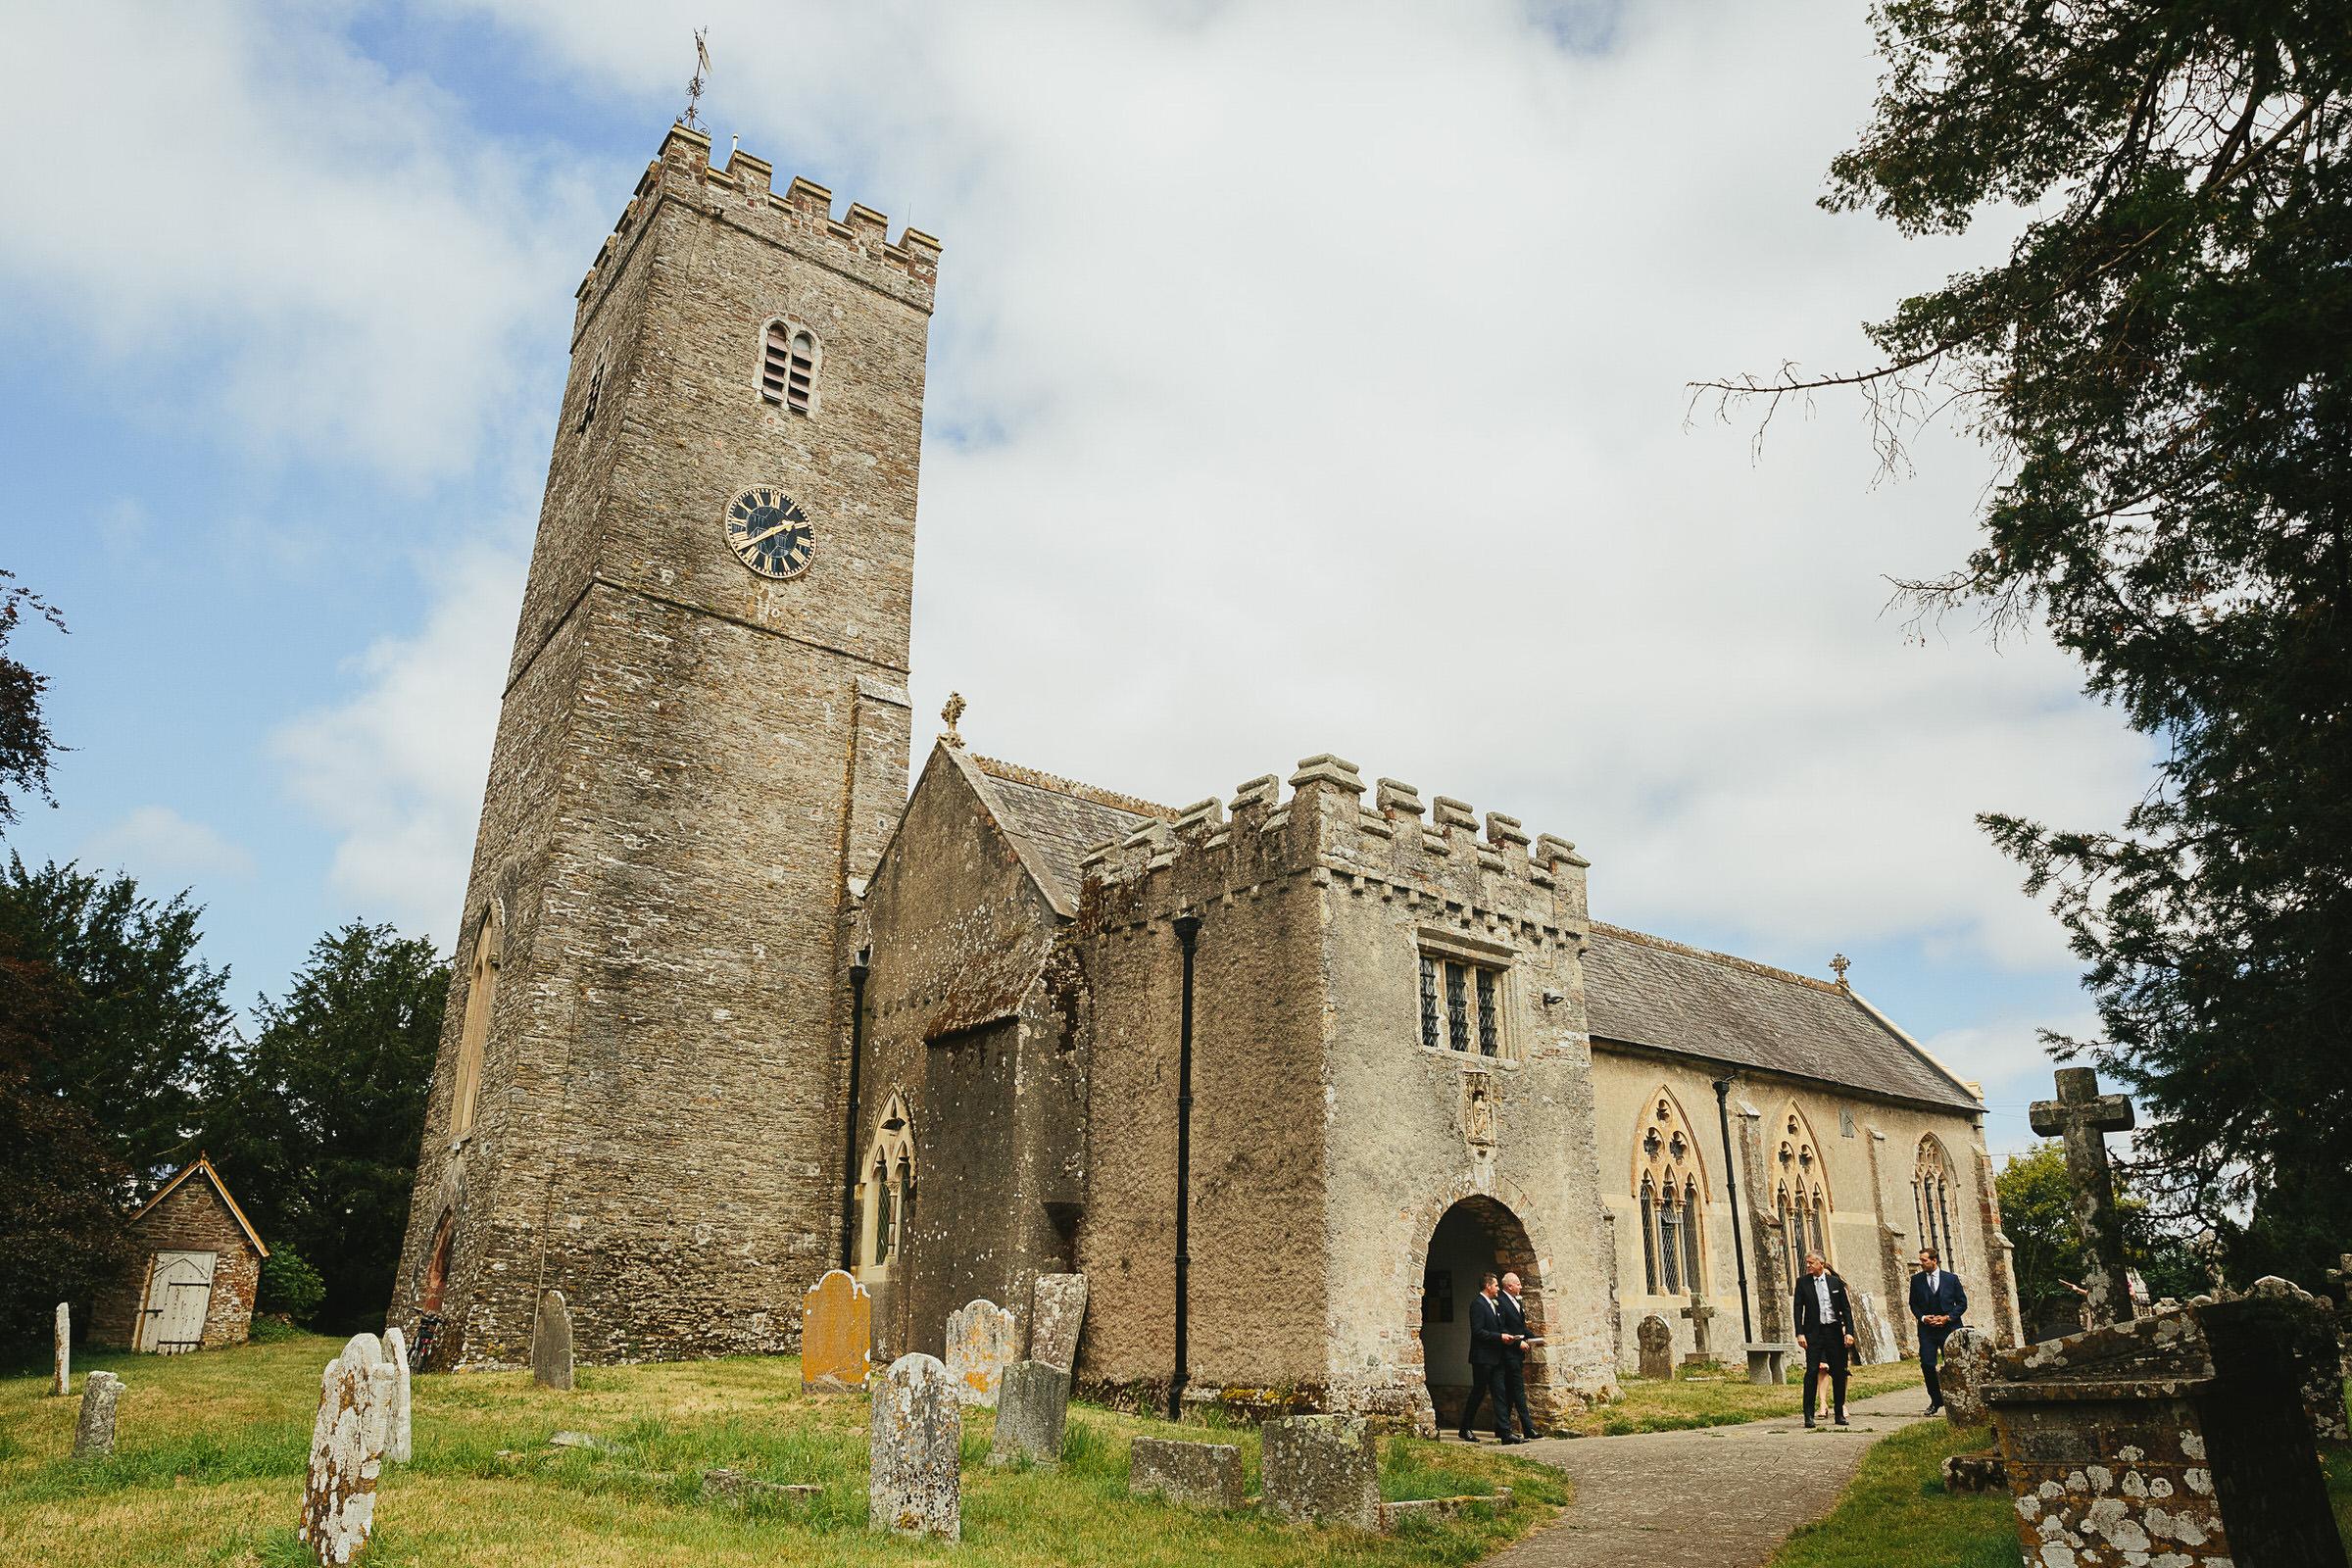 Staverton church